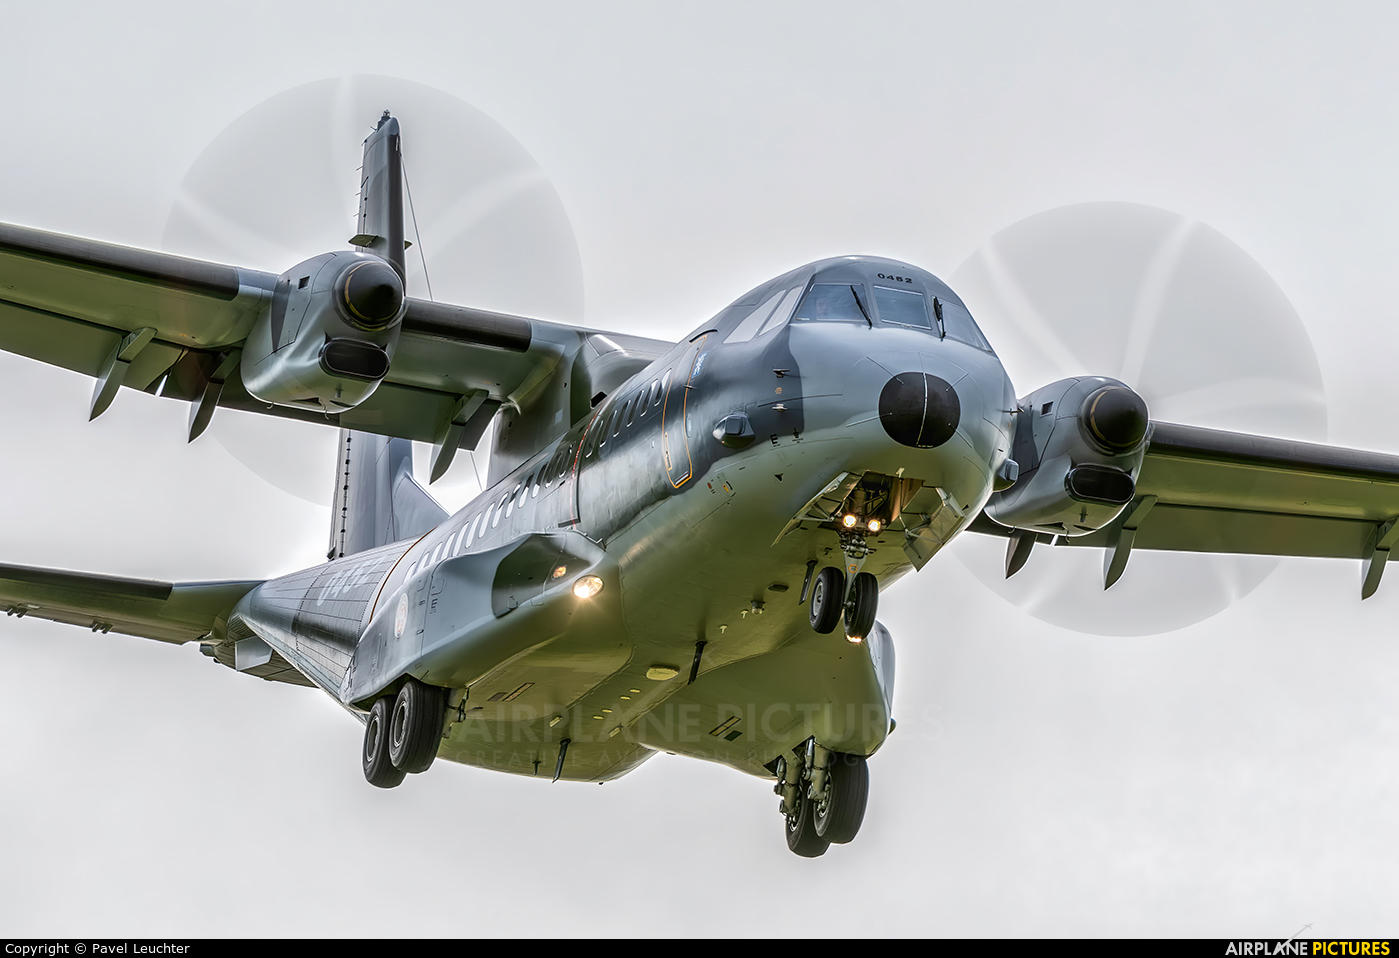 Czech - Air Force 0452 aircraft at Pardubice